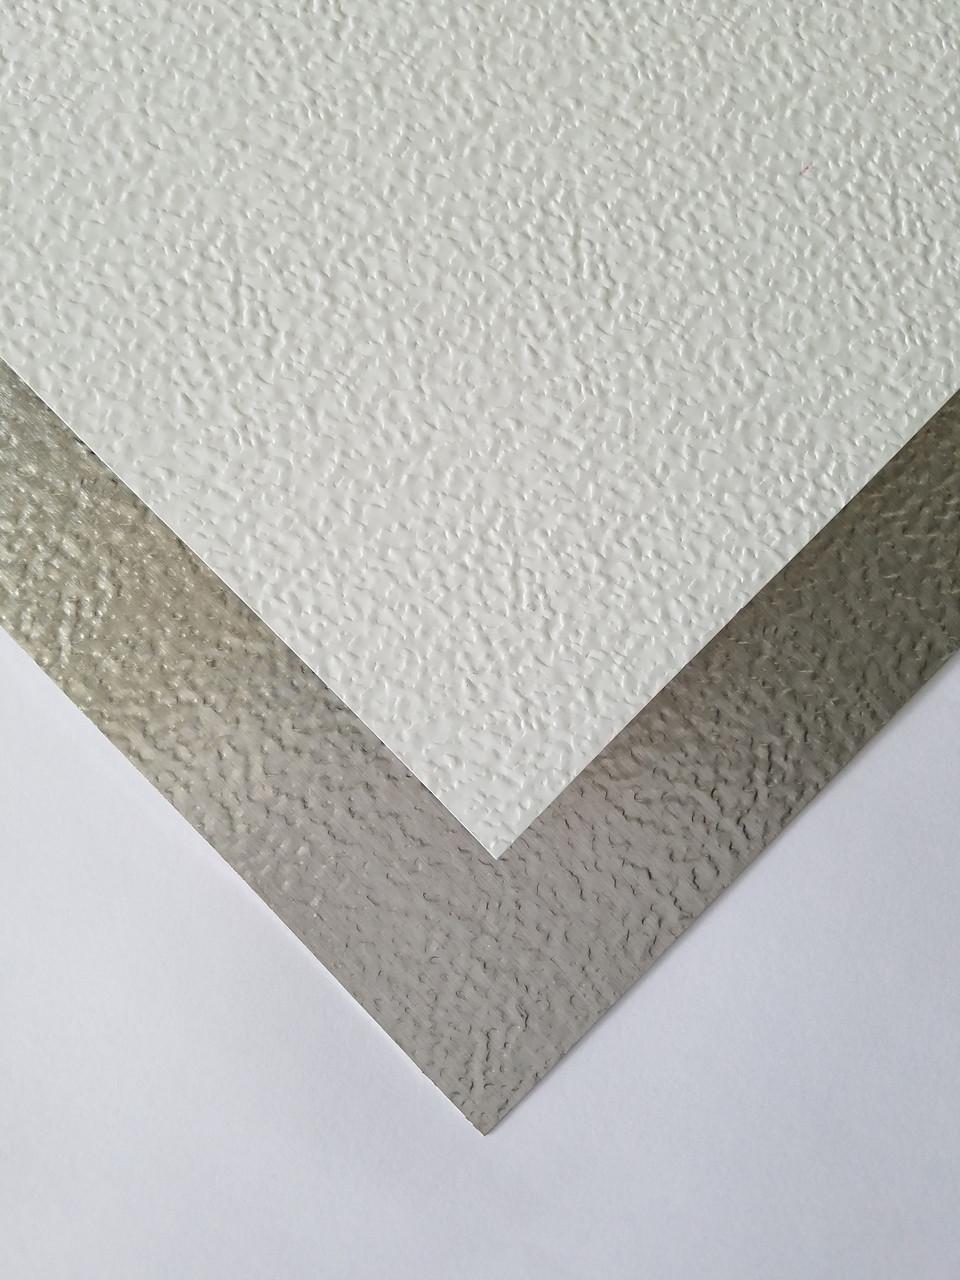 12 X 72 Stucco Embossed Aluminum Sheet Cutsmetal